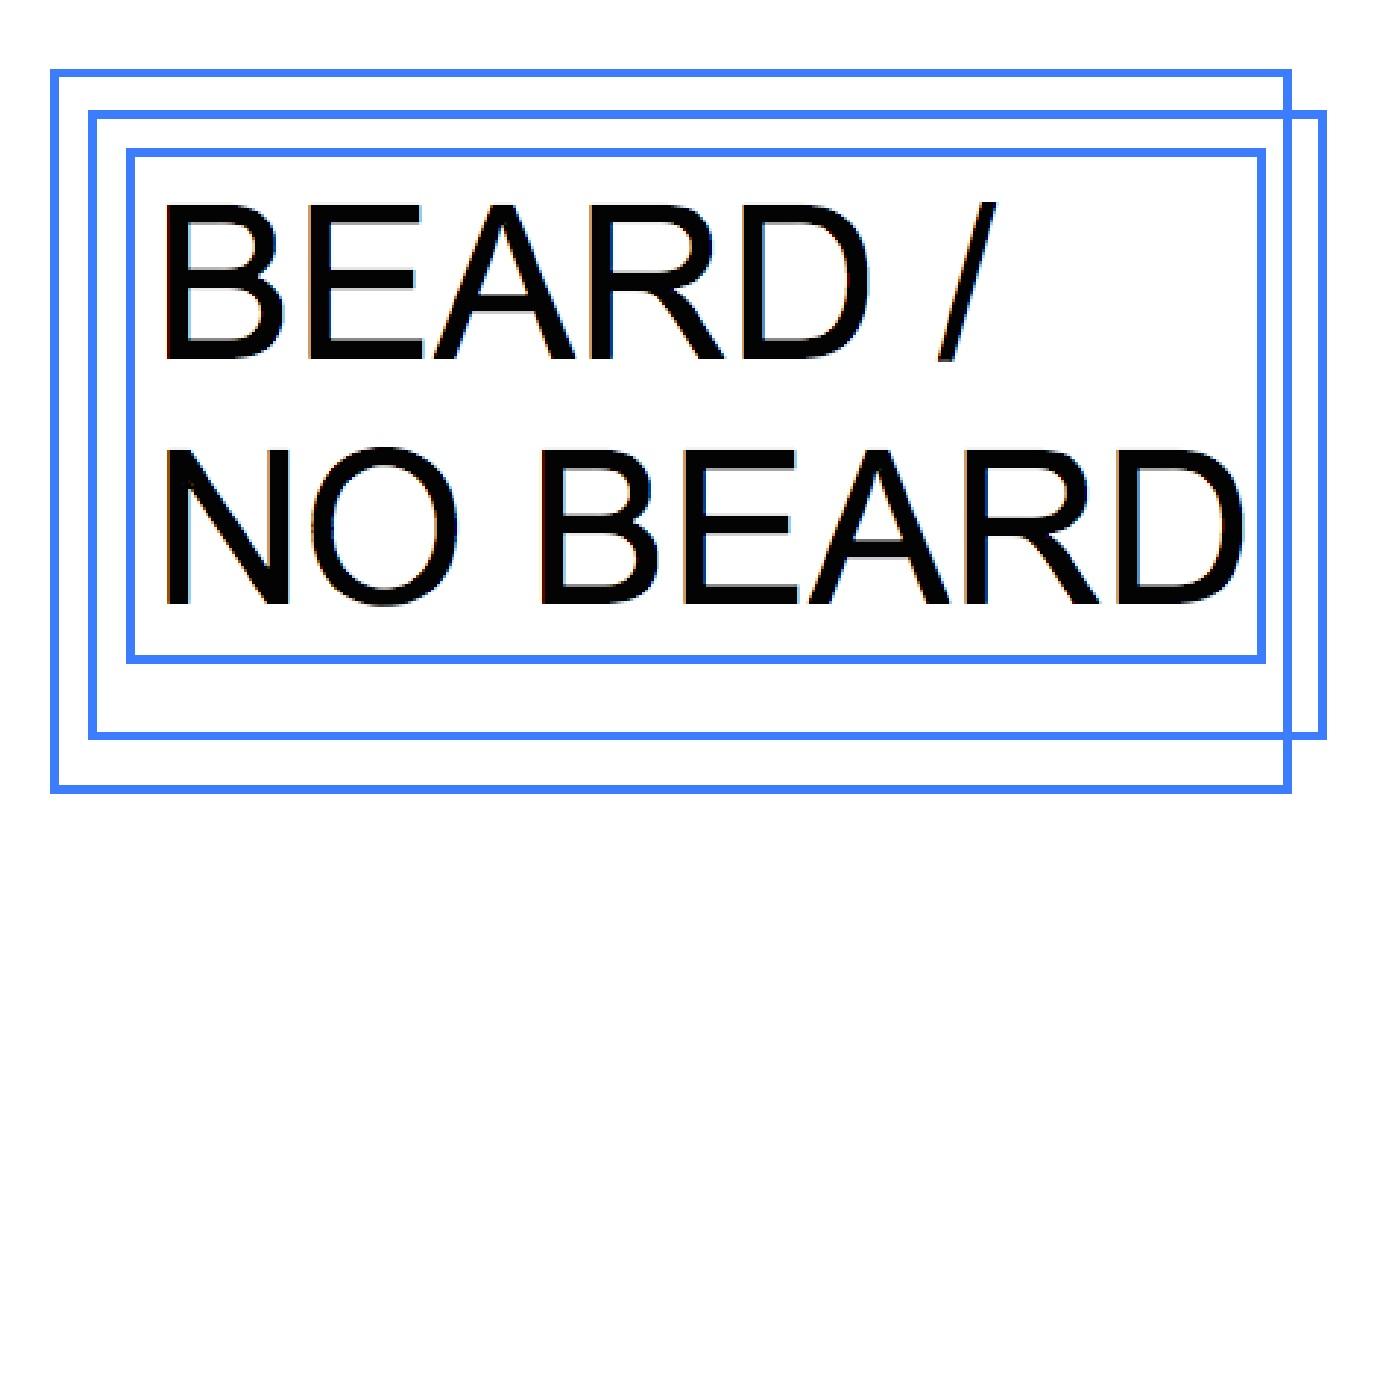 BEARD / NO BEARD